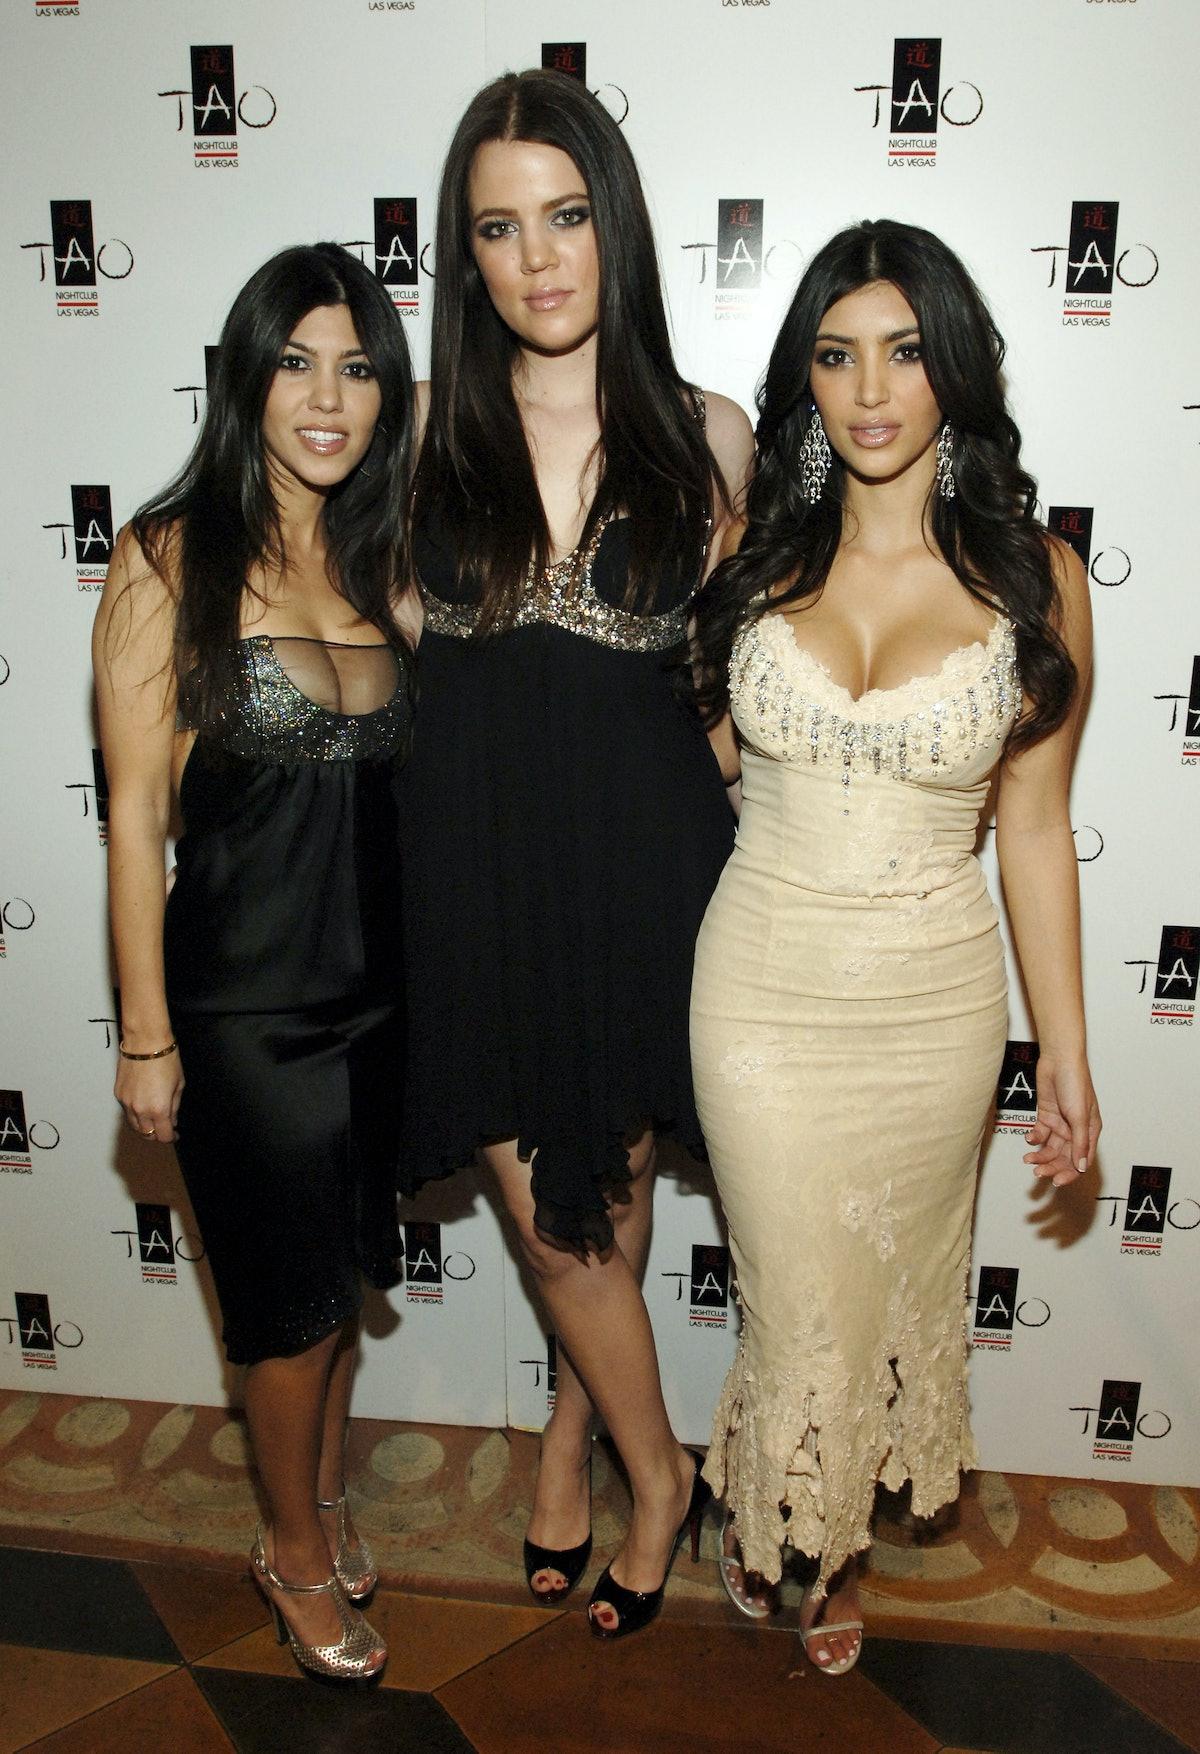 Kourtney Kardashian, Klohe Kardashian and Kim Kardashian (Photo by Denise Truscello/WireImage)